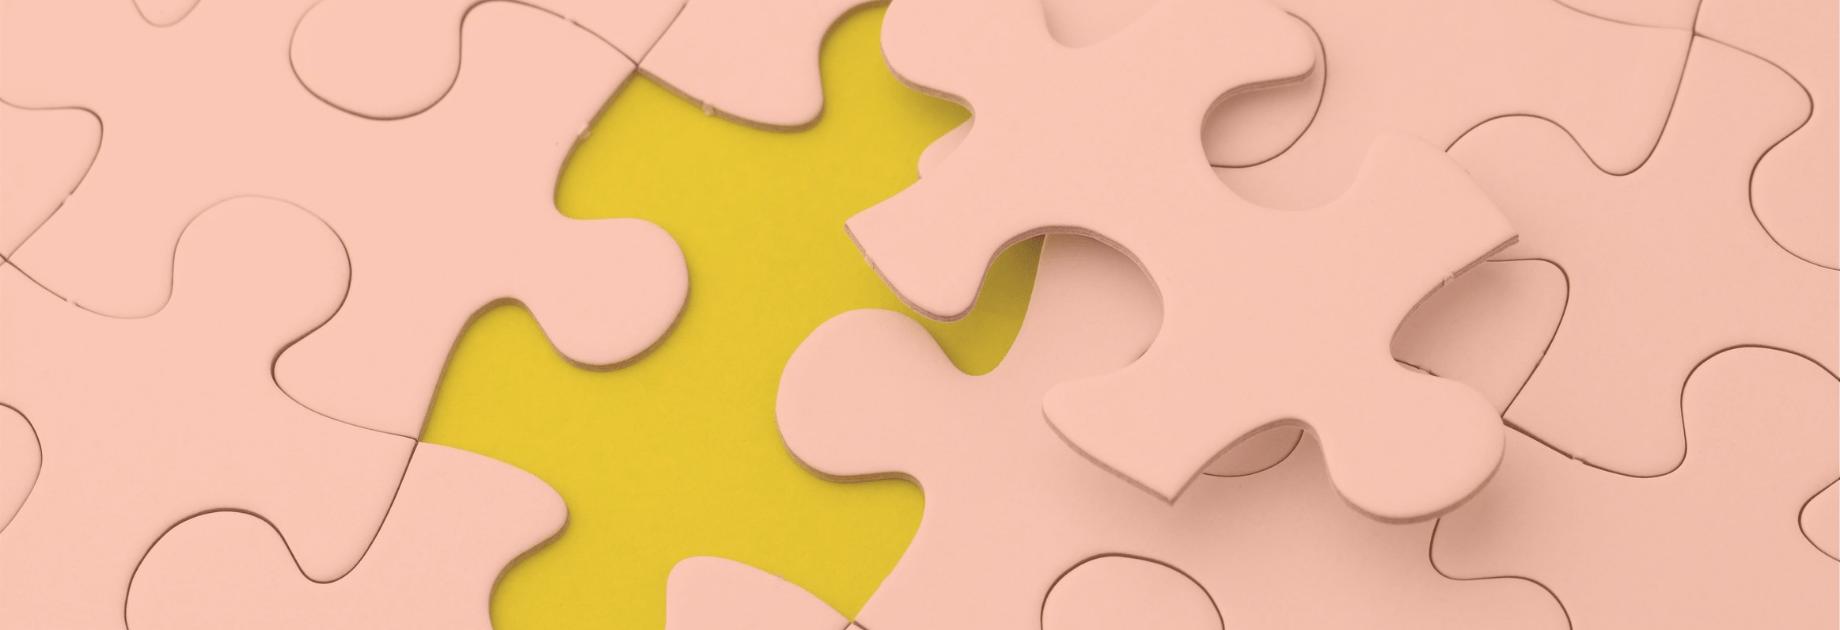 Digital Integration: puzzle